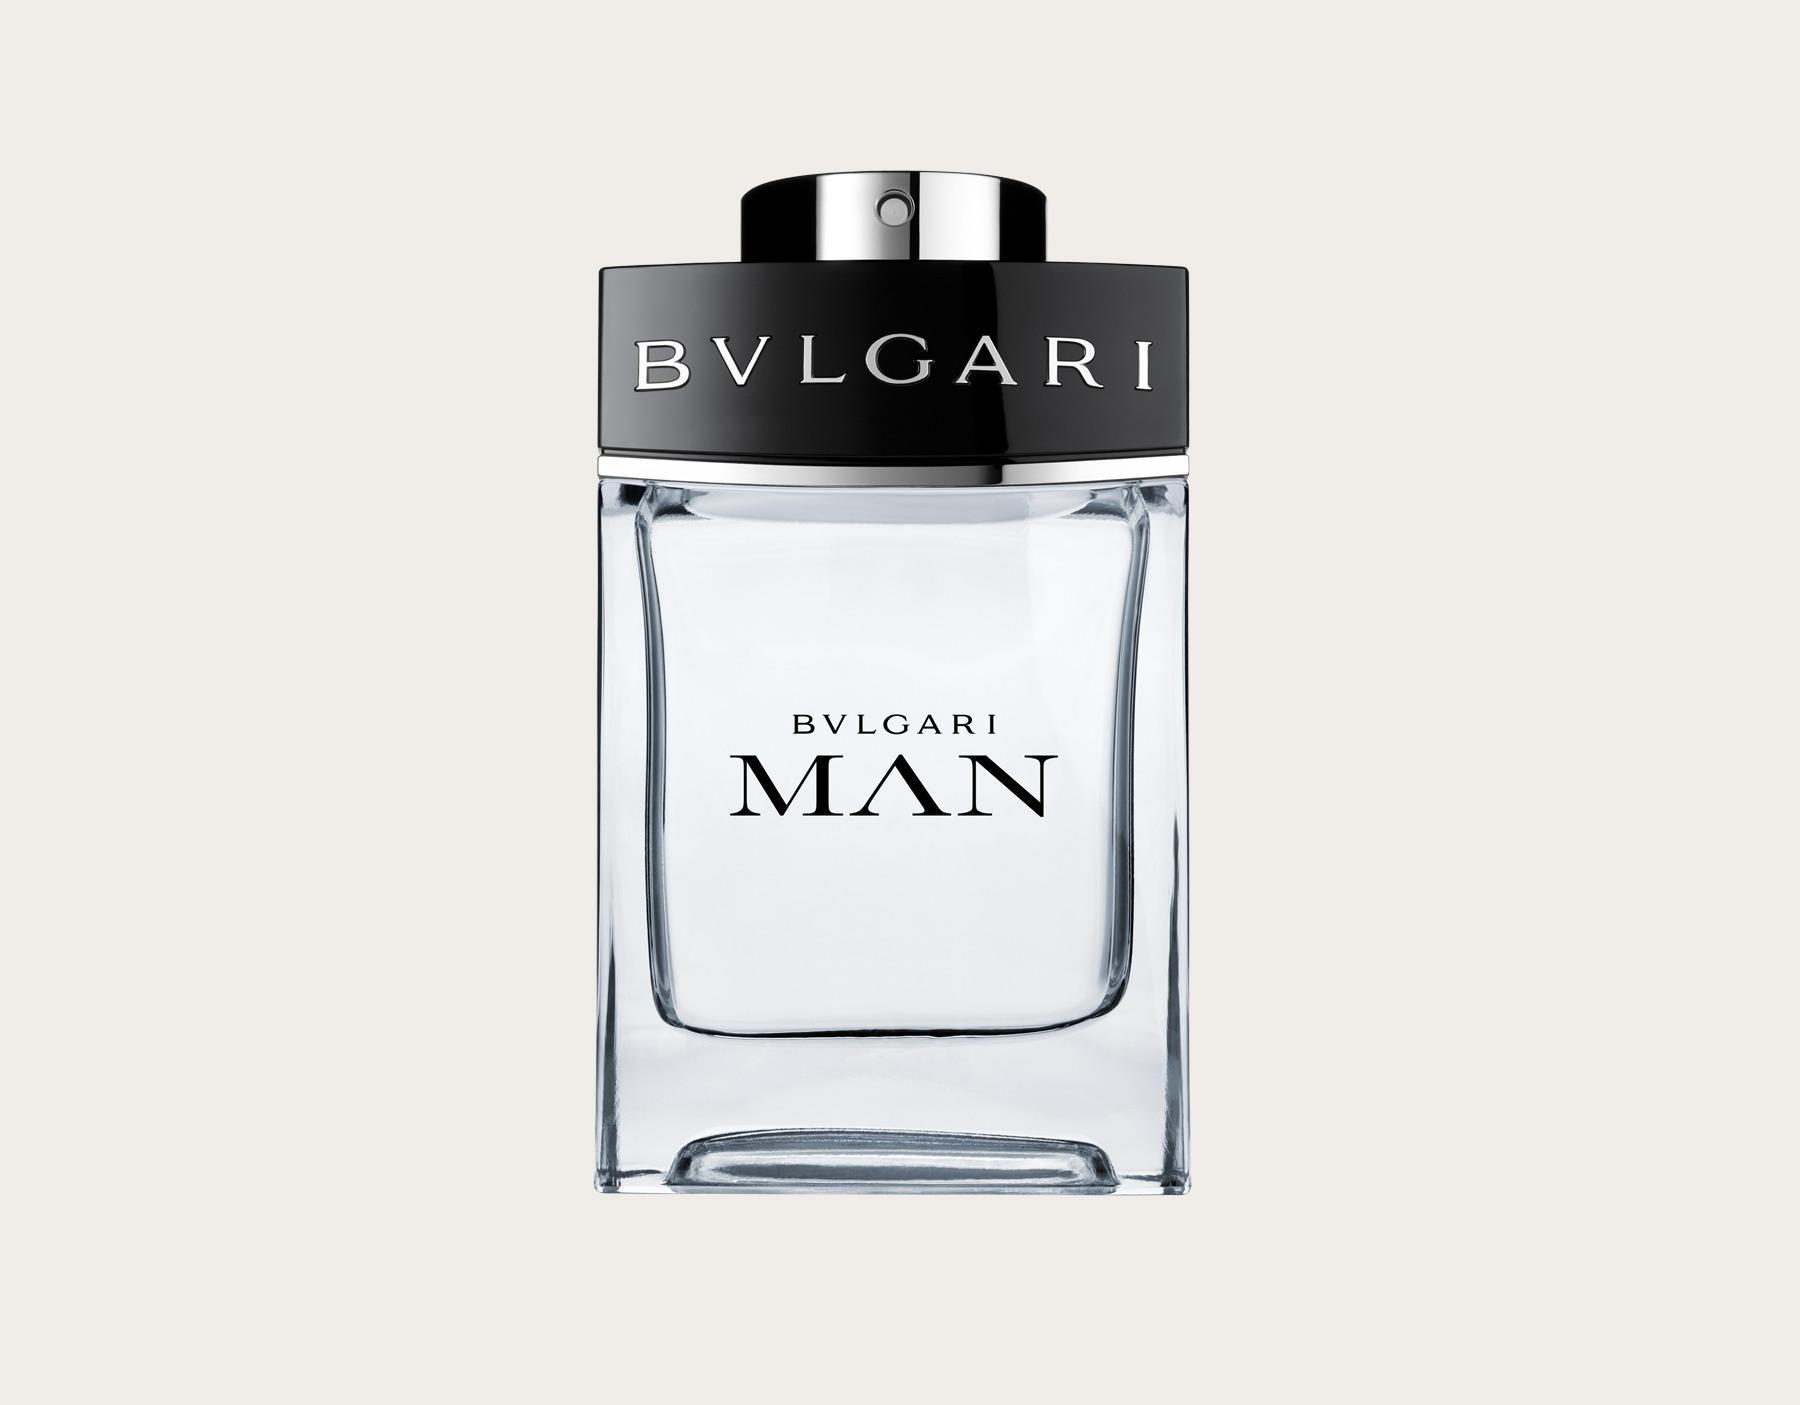 Bvlgari Man (EDT,Man,TESTER,100ml) T-MLX20872 Vīriešu Smaržas